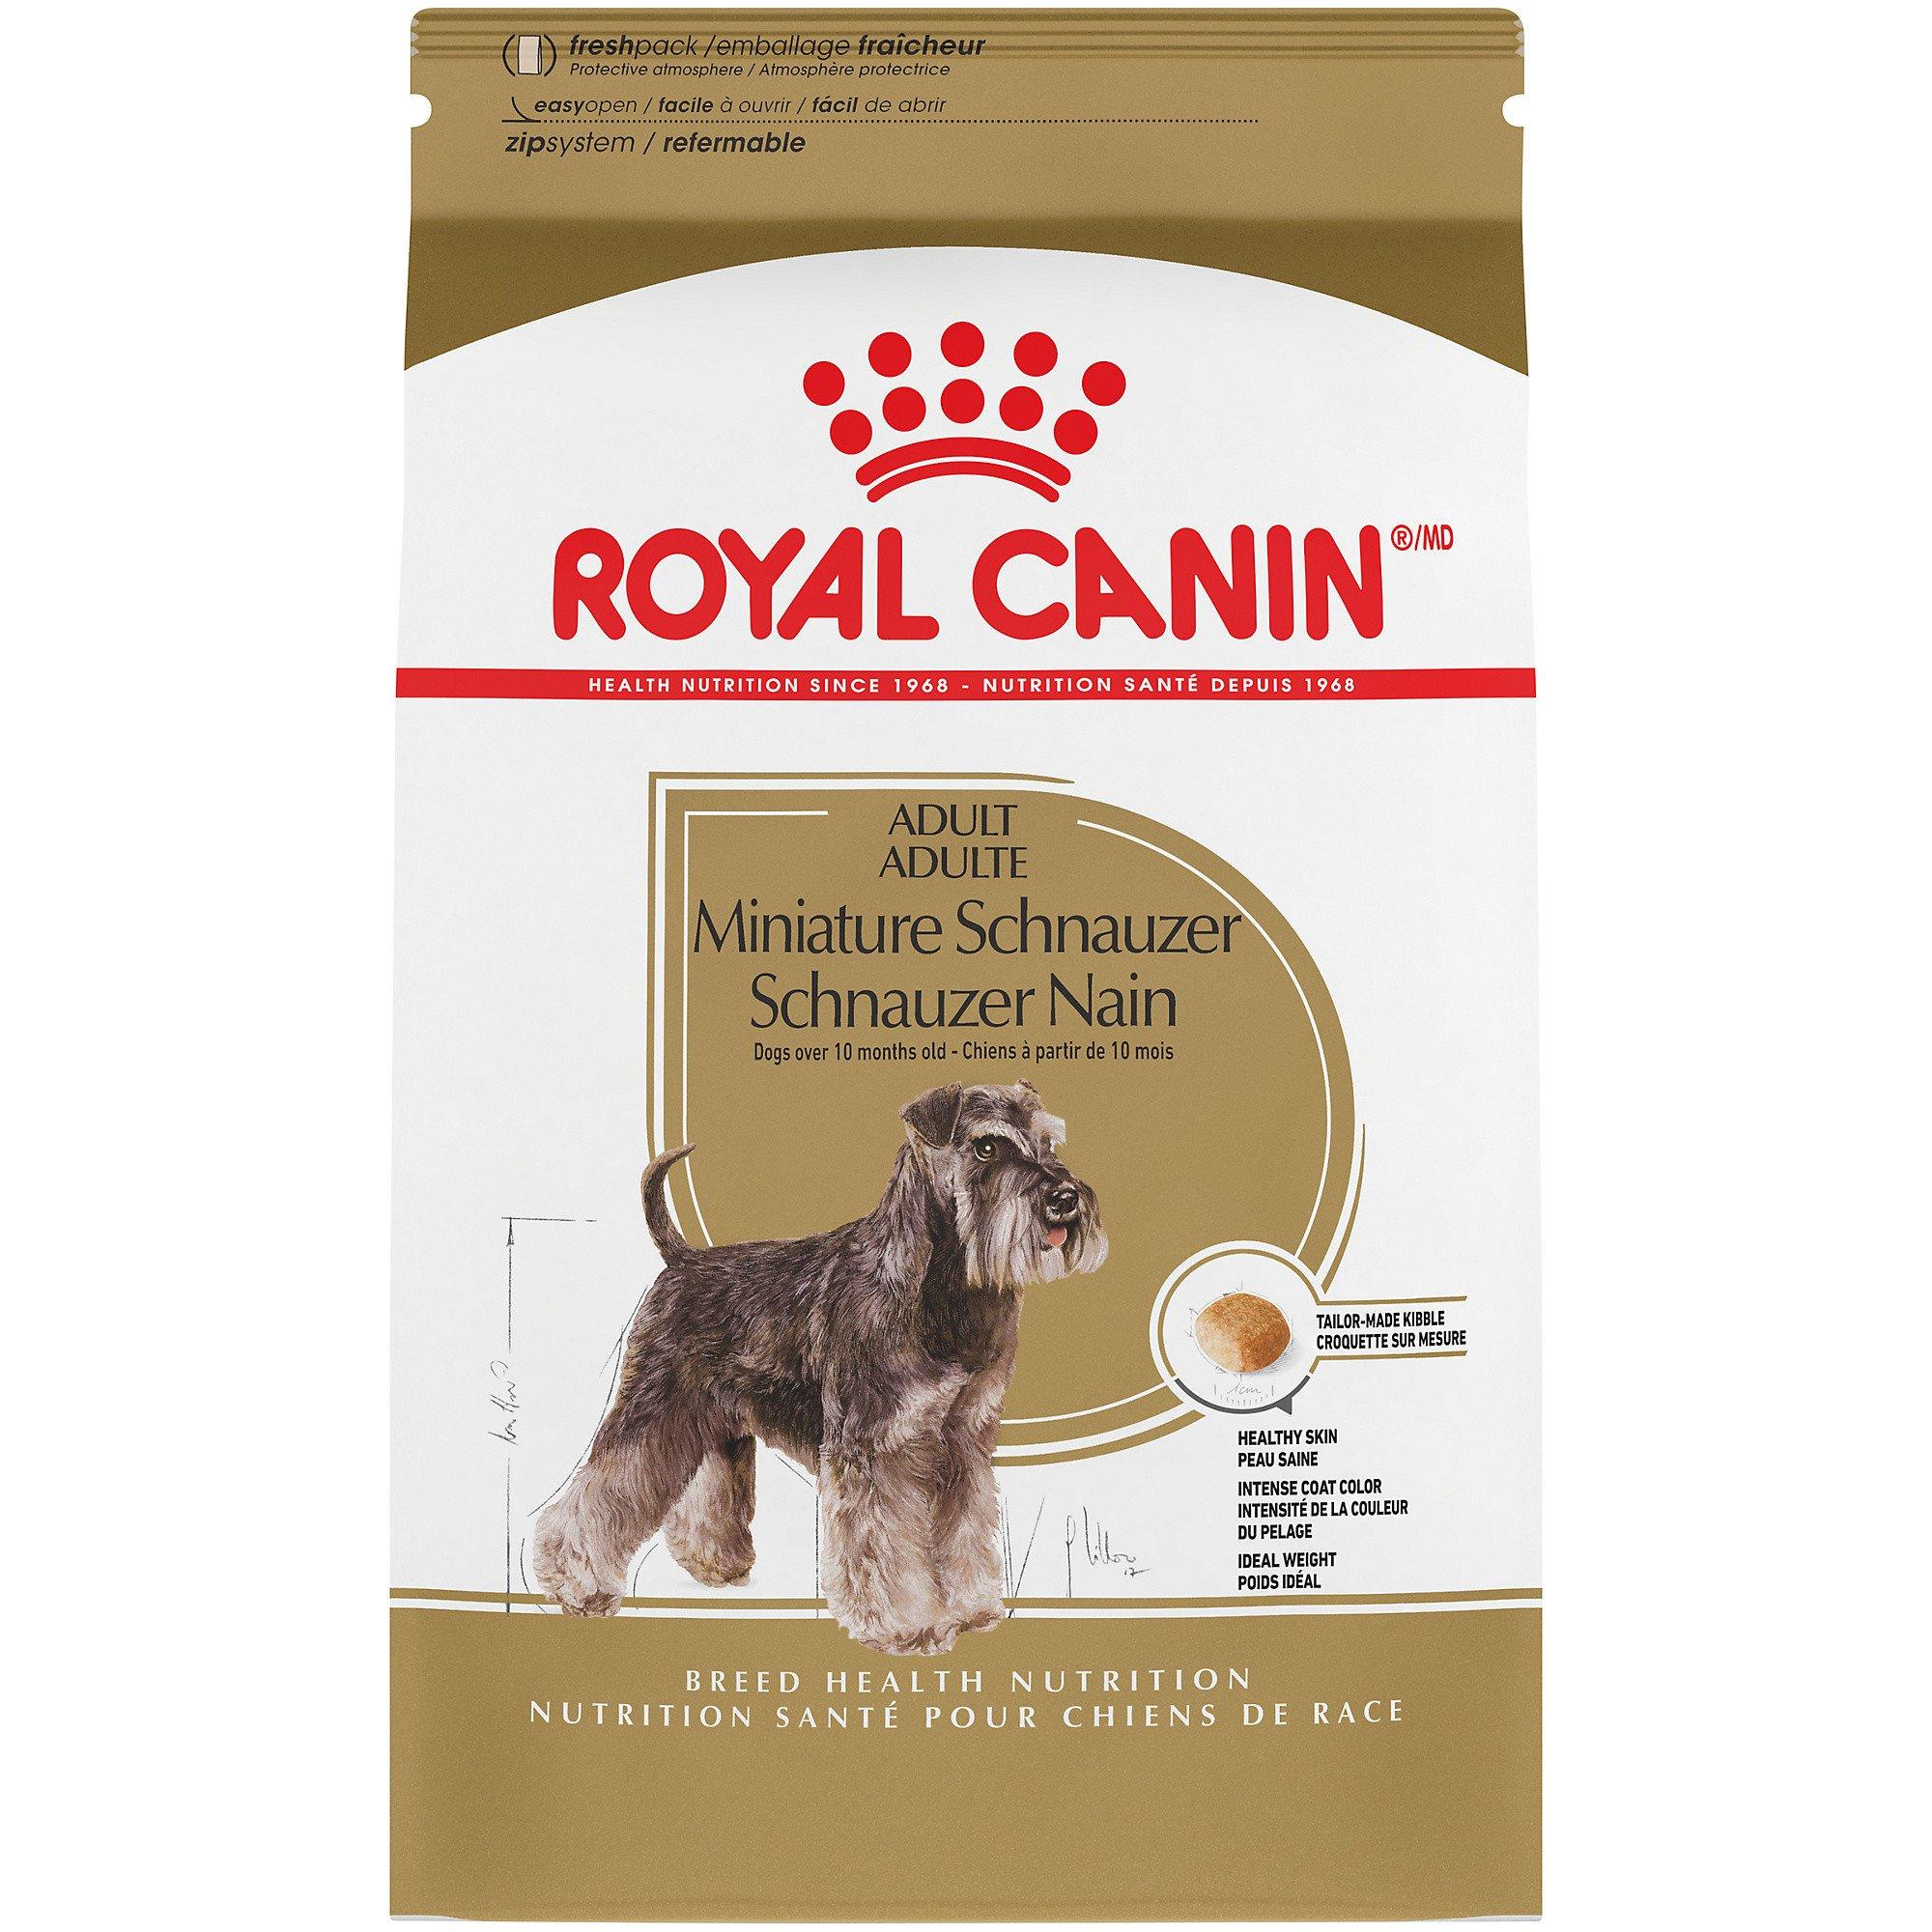 Royal canin miniature schnauzer food review